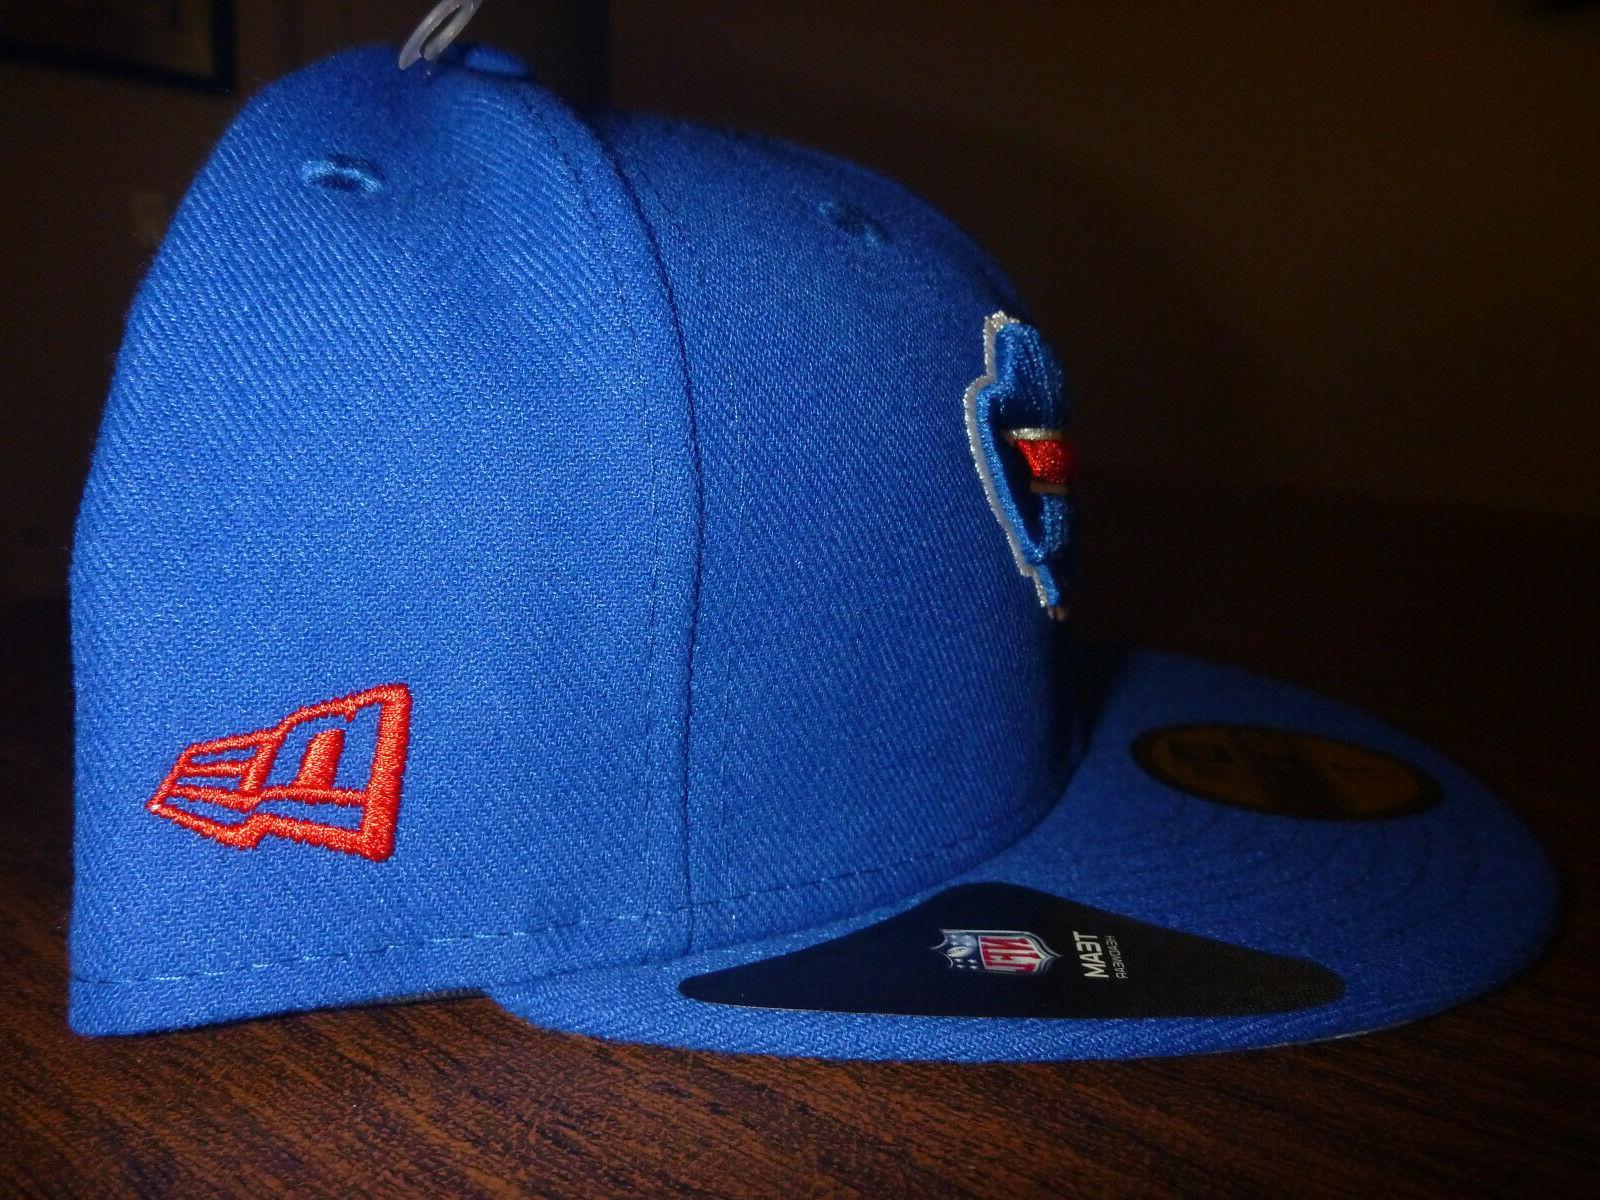 BUFFALO BILLS NEW 59FIFTY NFL FIELD TEAM BASIC BLUE HAT